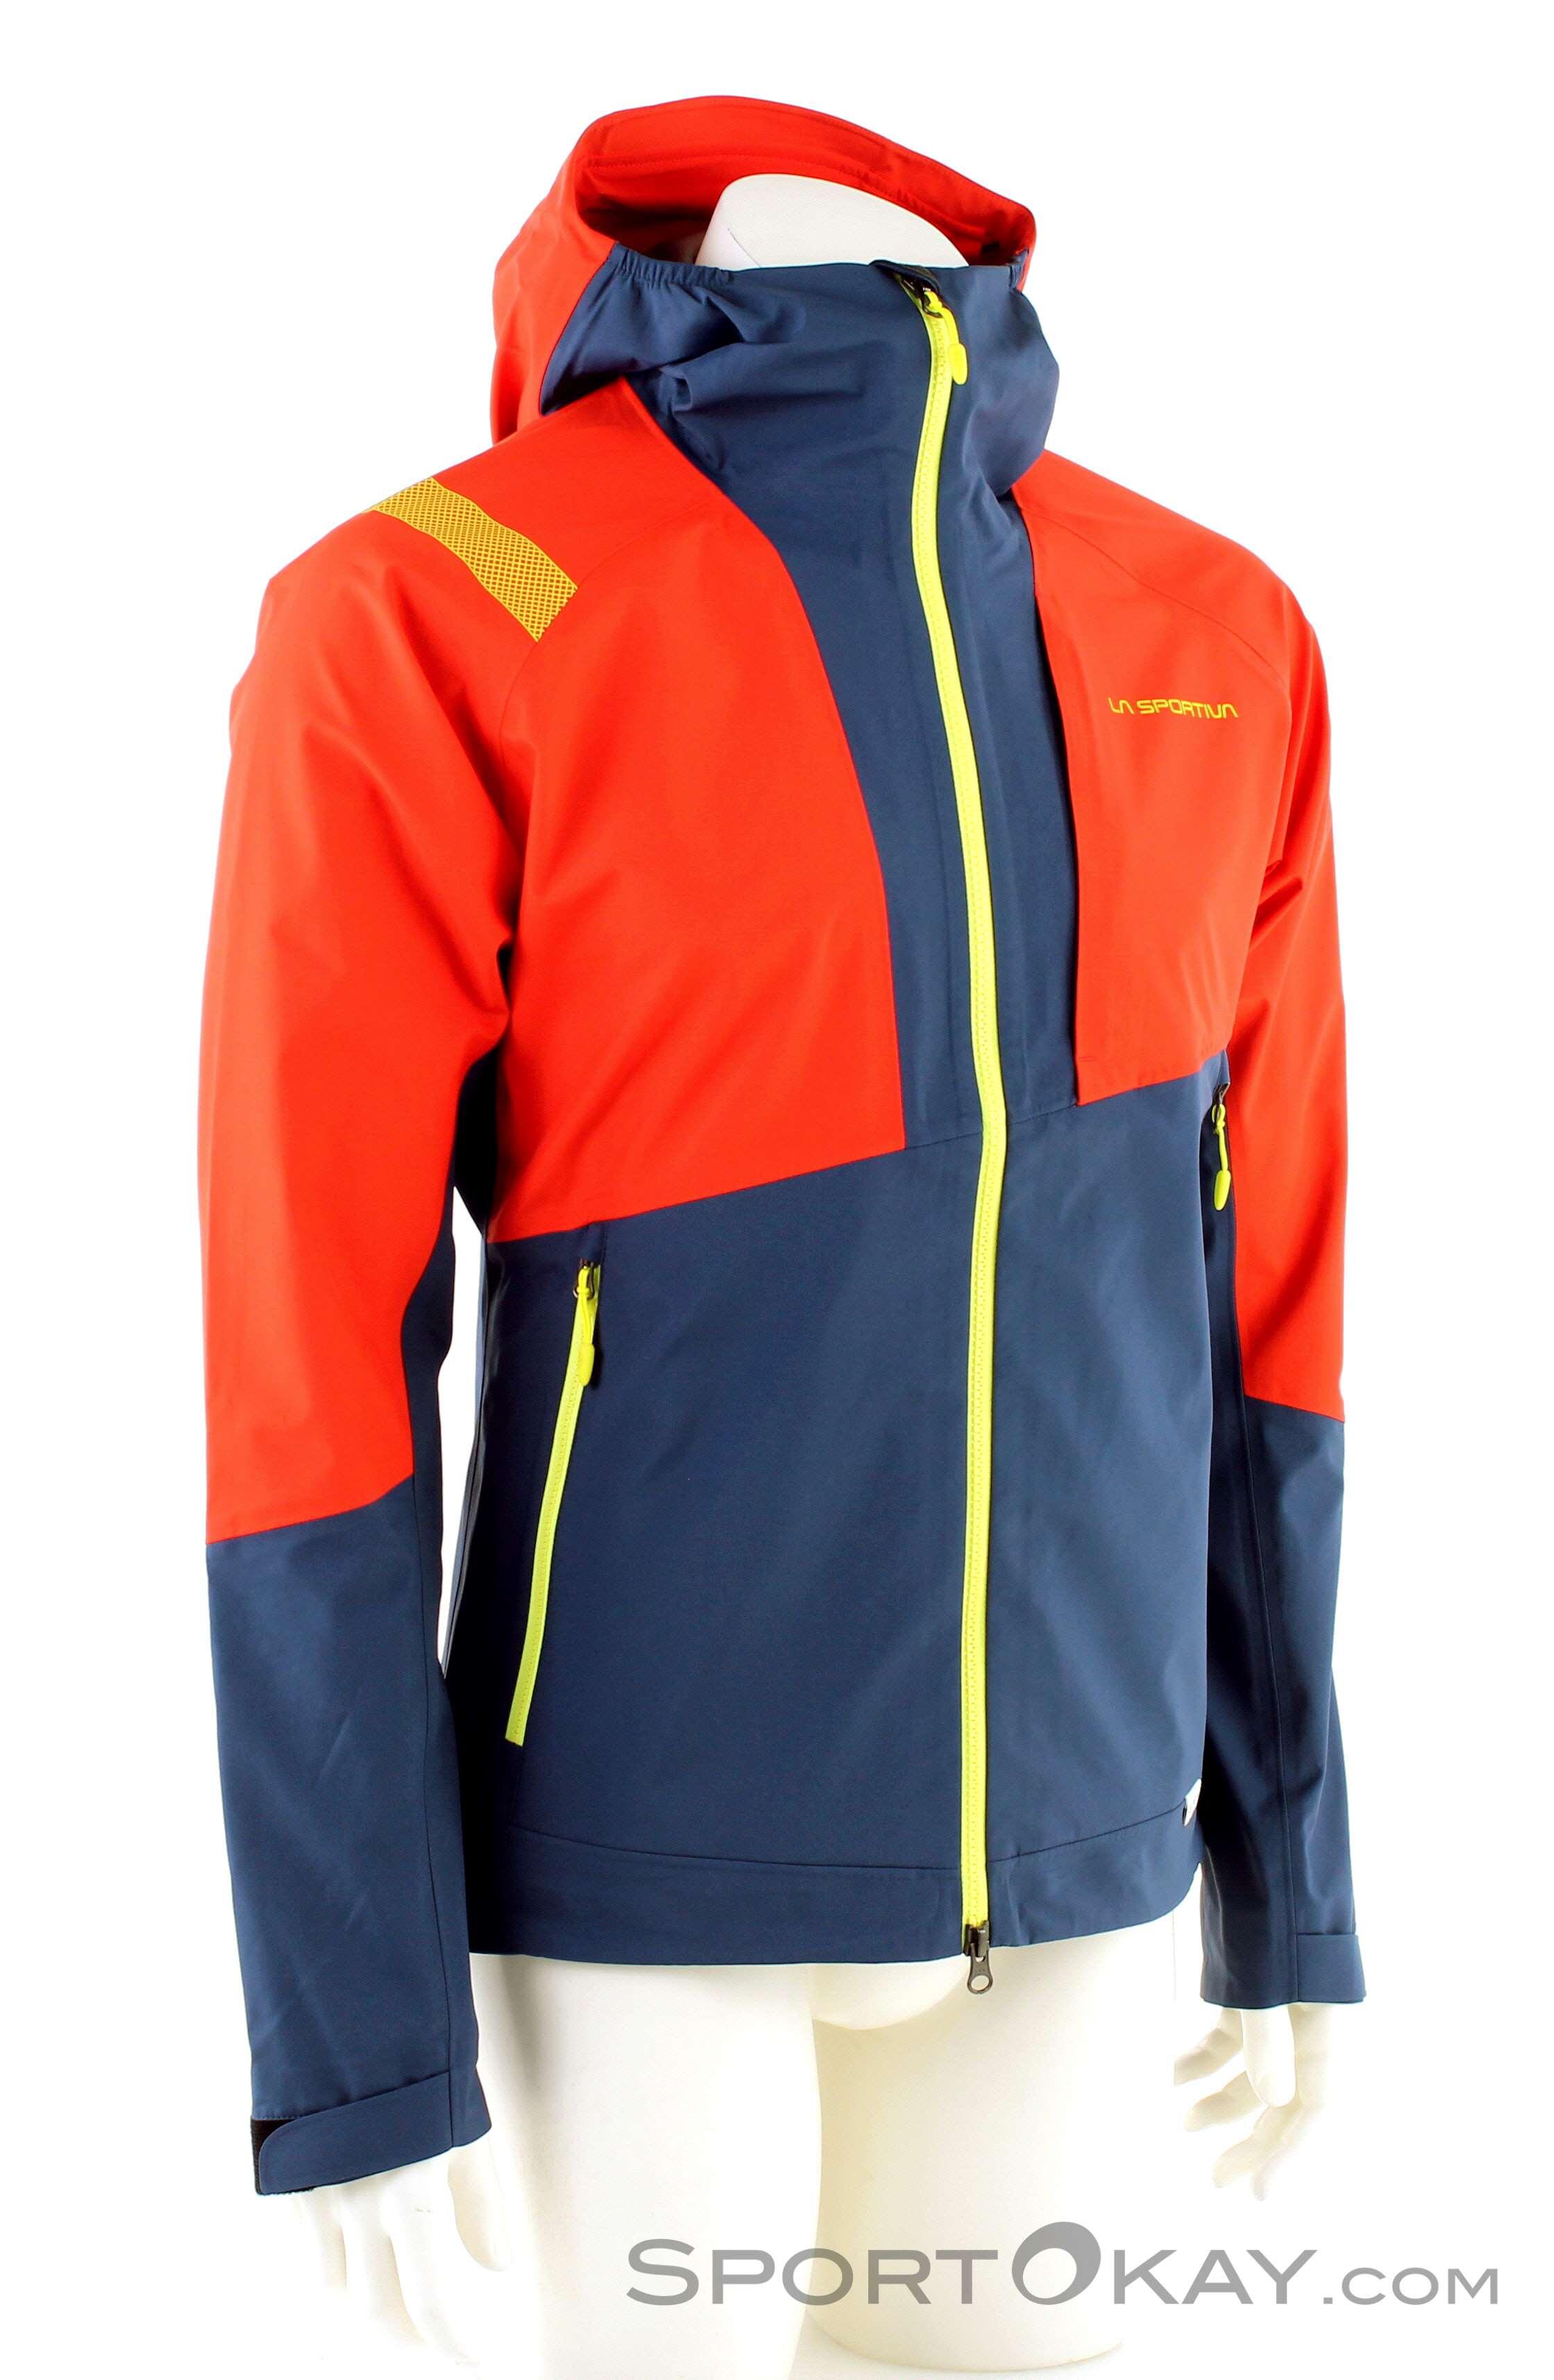 La Sportiva La Sportiva Mars Mens Ski Touring Jacket